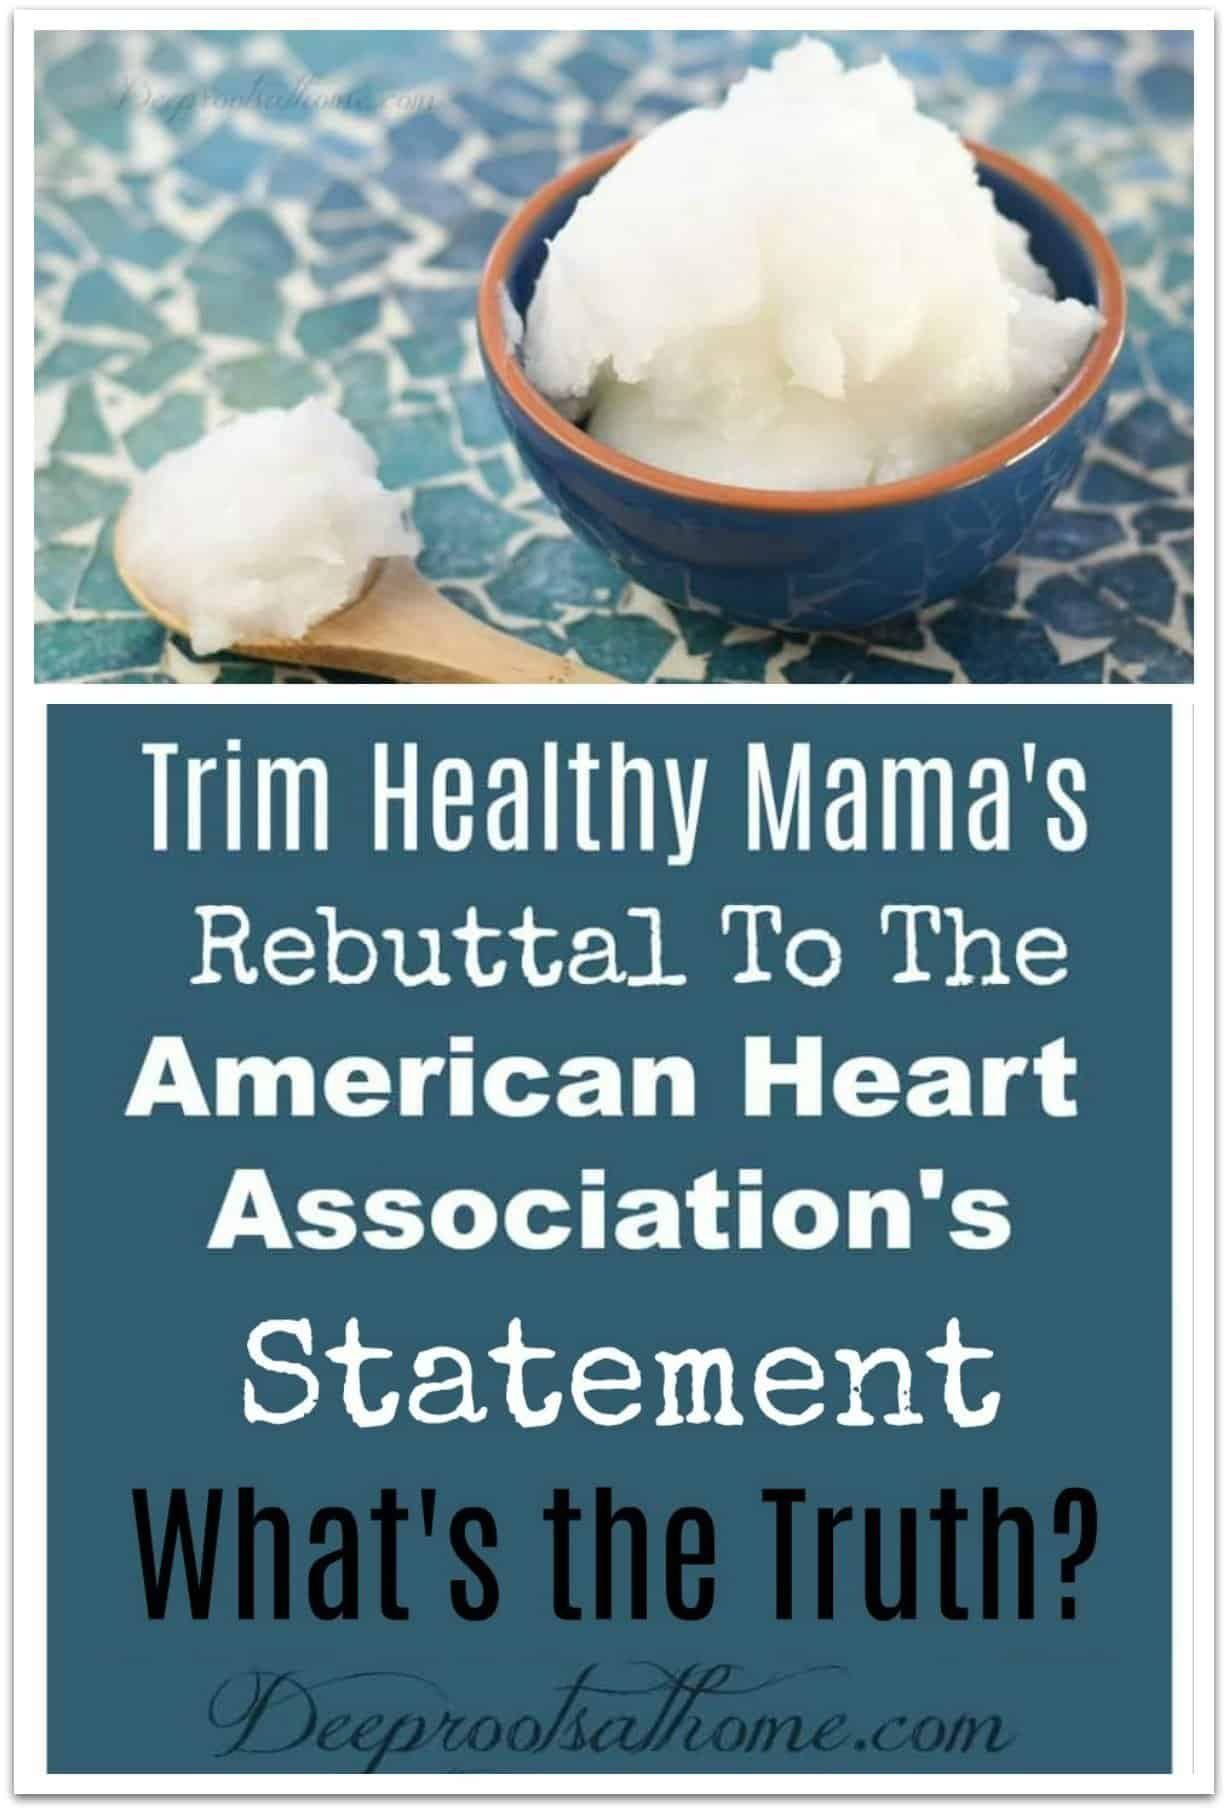 Trim Healthy Mama vs American Heart Association On Coconut